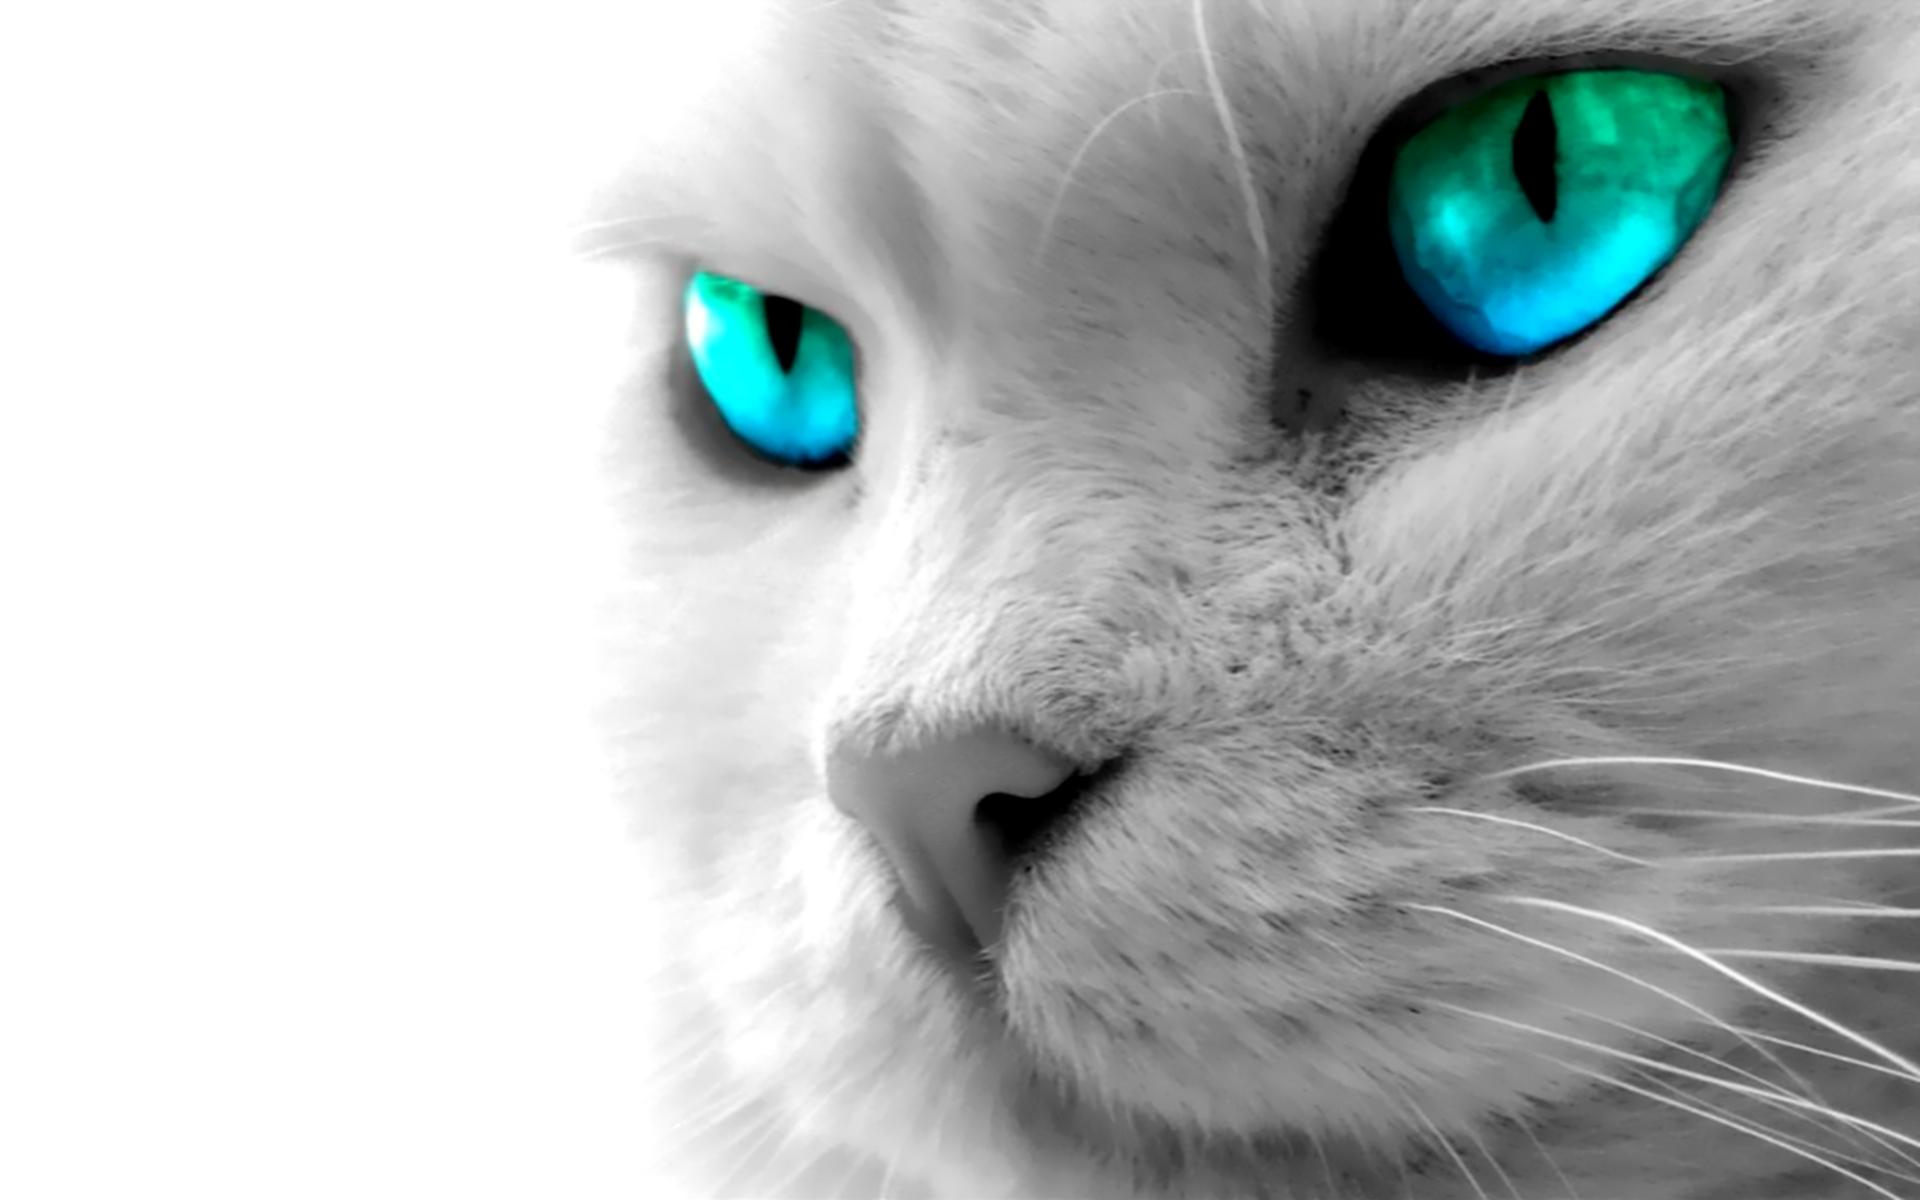 Animal - Cat  Photography Feline Pet Animal Wallpaper